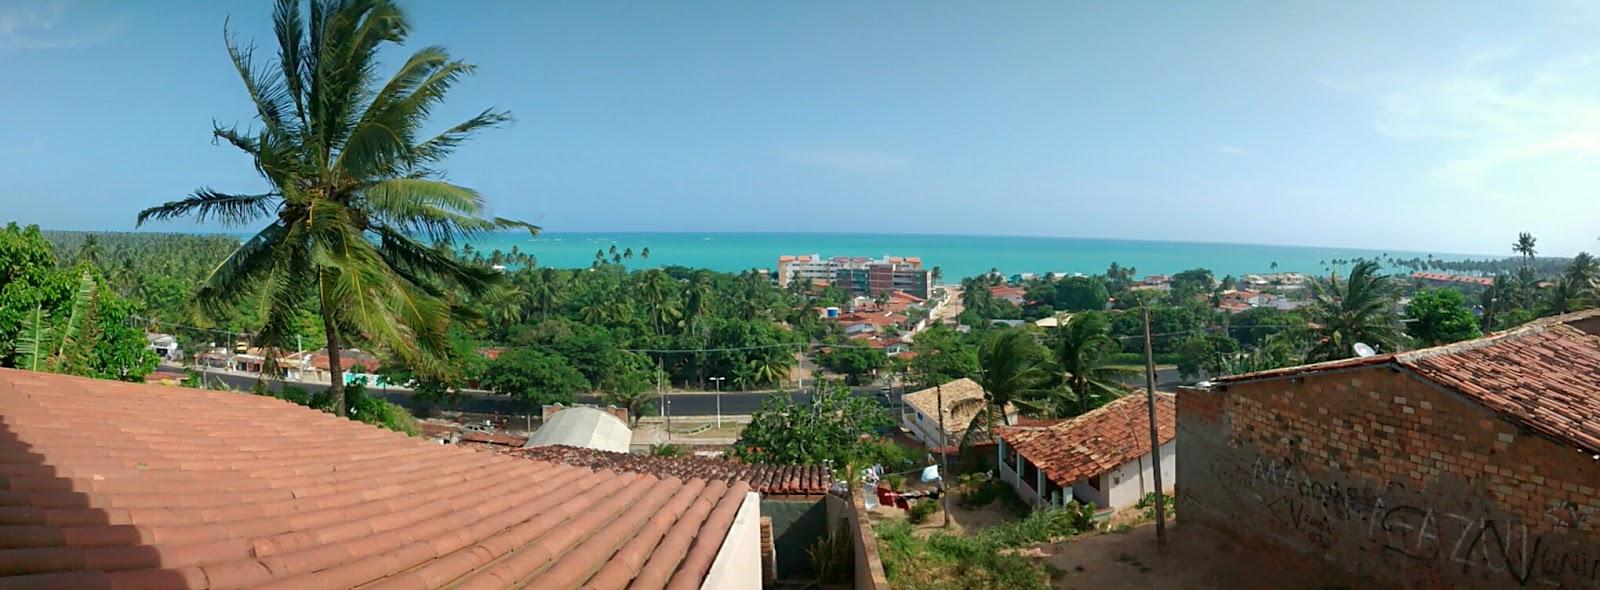 Vista do restaurante Vila Chamusca.